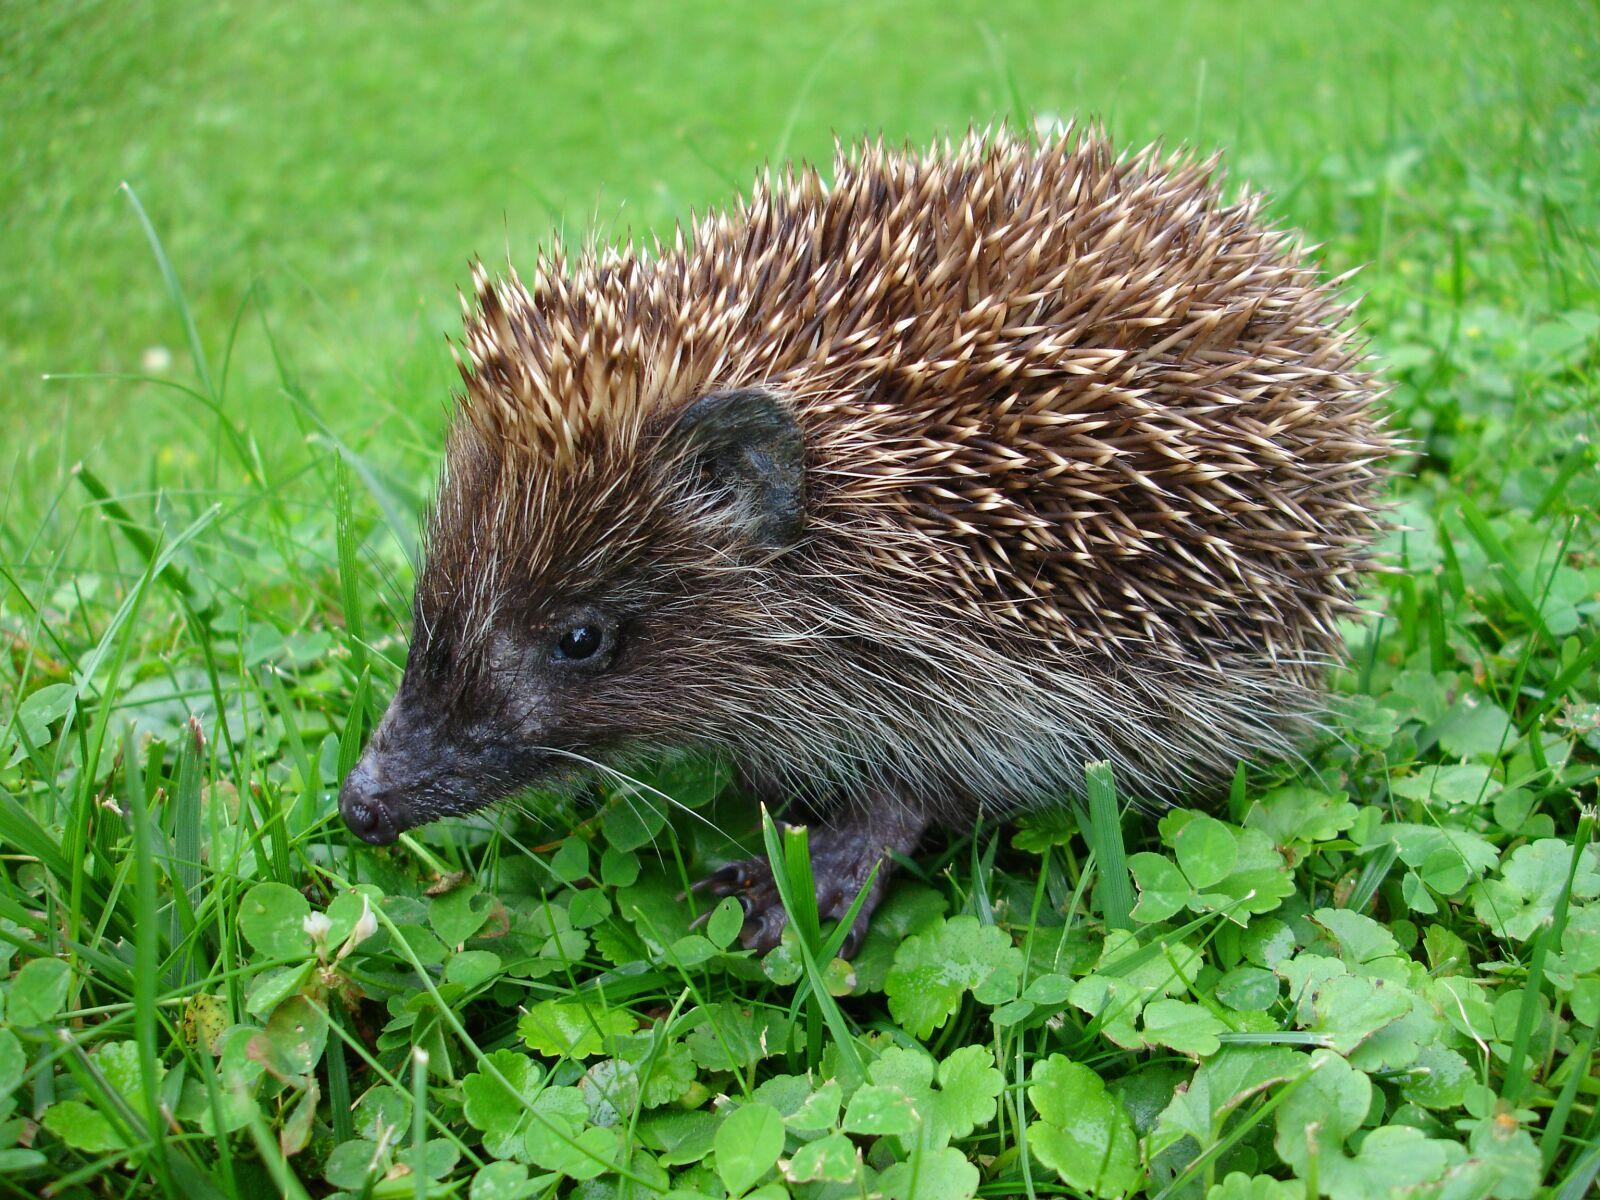 hedgehog, erinaceinae, mammal